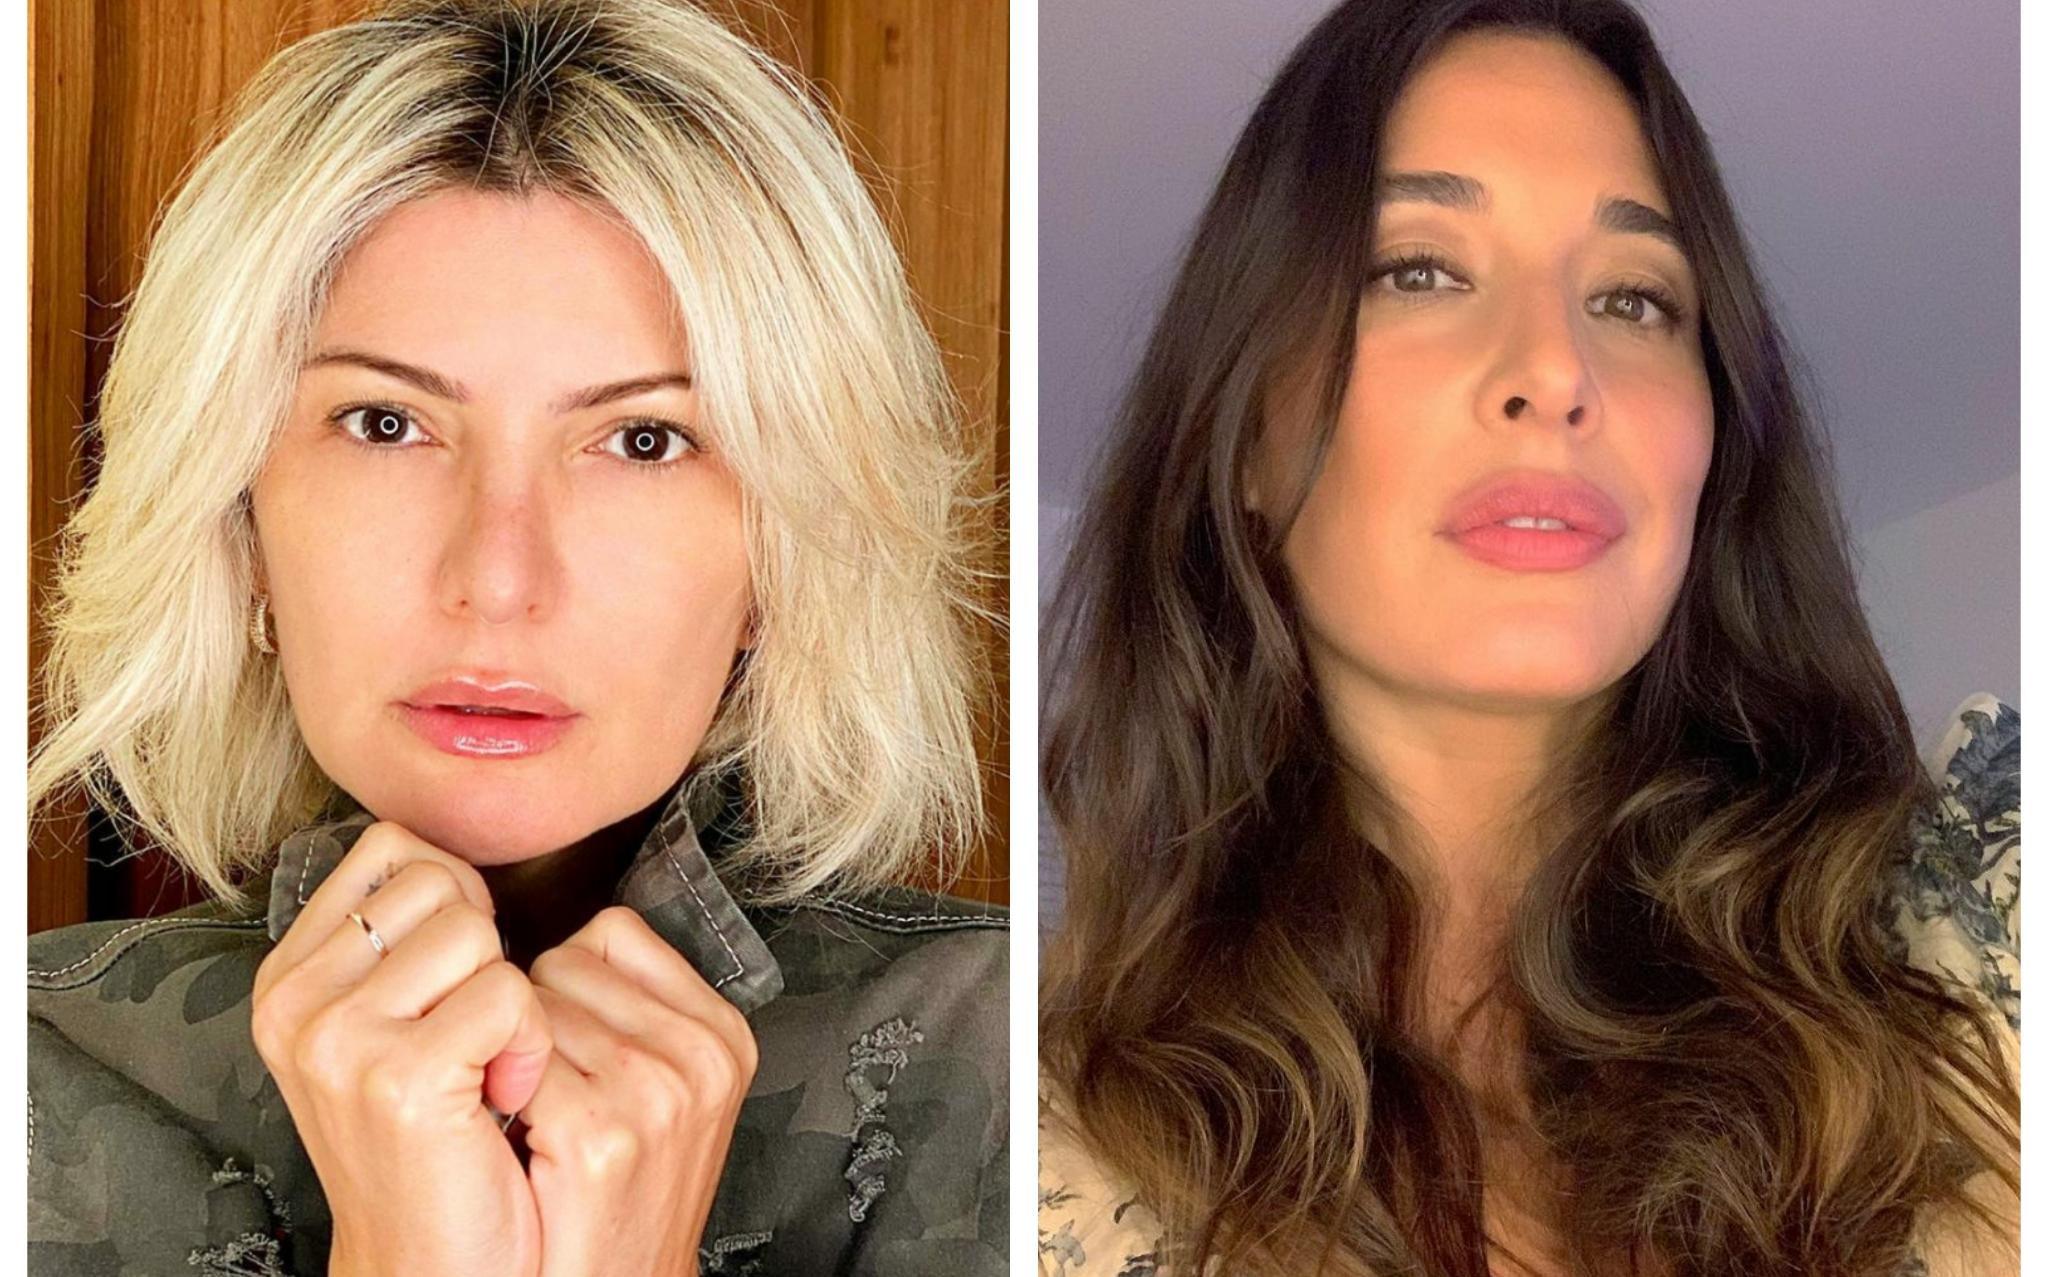 Antônia Fontenelle rebate acusações de assédio feitas por Gisele Itié